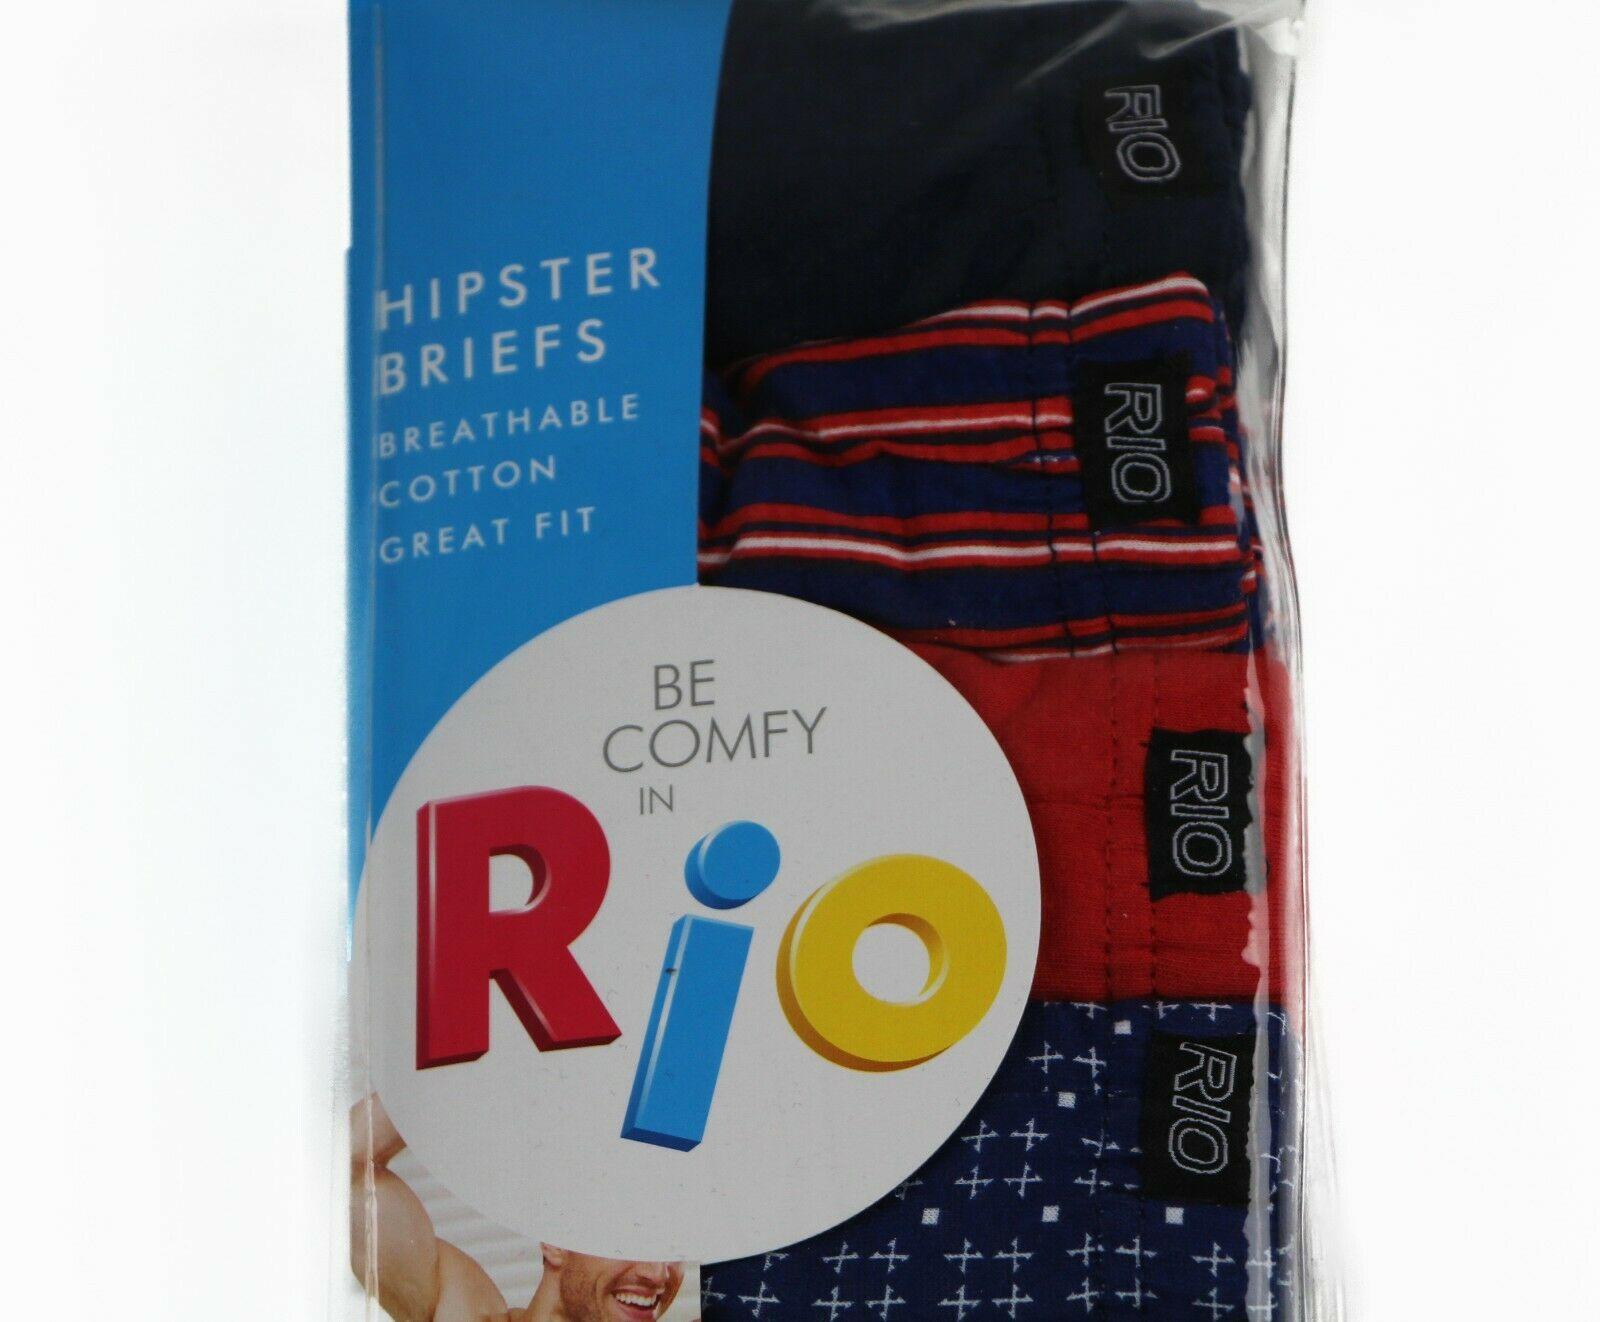 MENS-RIO-7-PACK-SEXY-HIPSTER-BIKINI-BRIEF-COTTON-UNDERWEAR-JOCKS-BLACK-BRIEFS thumbnail 16